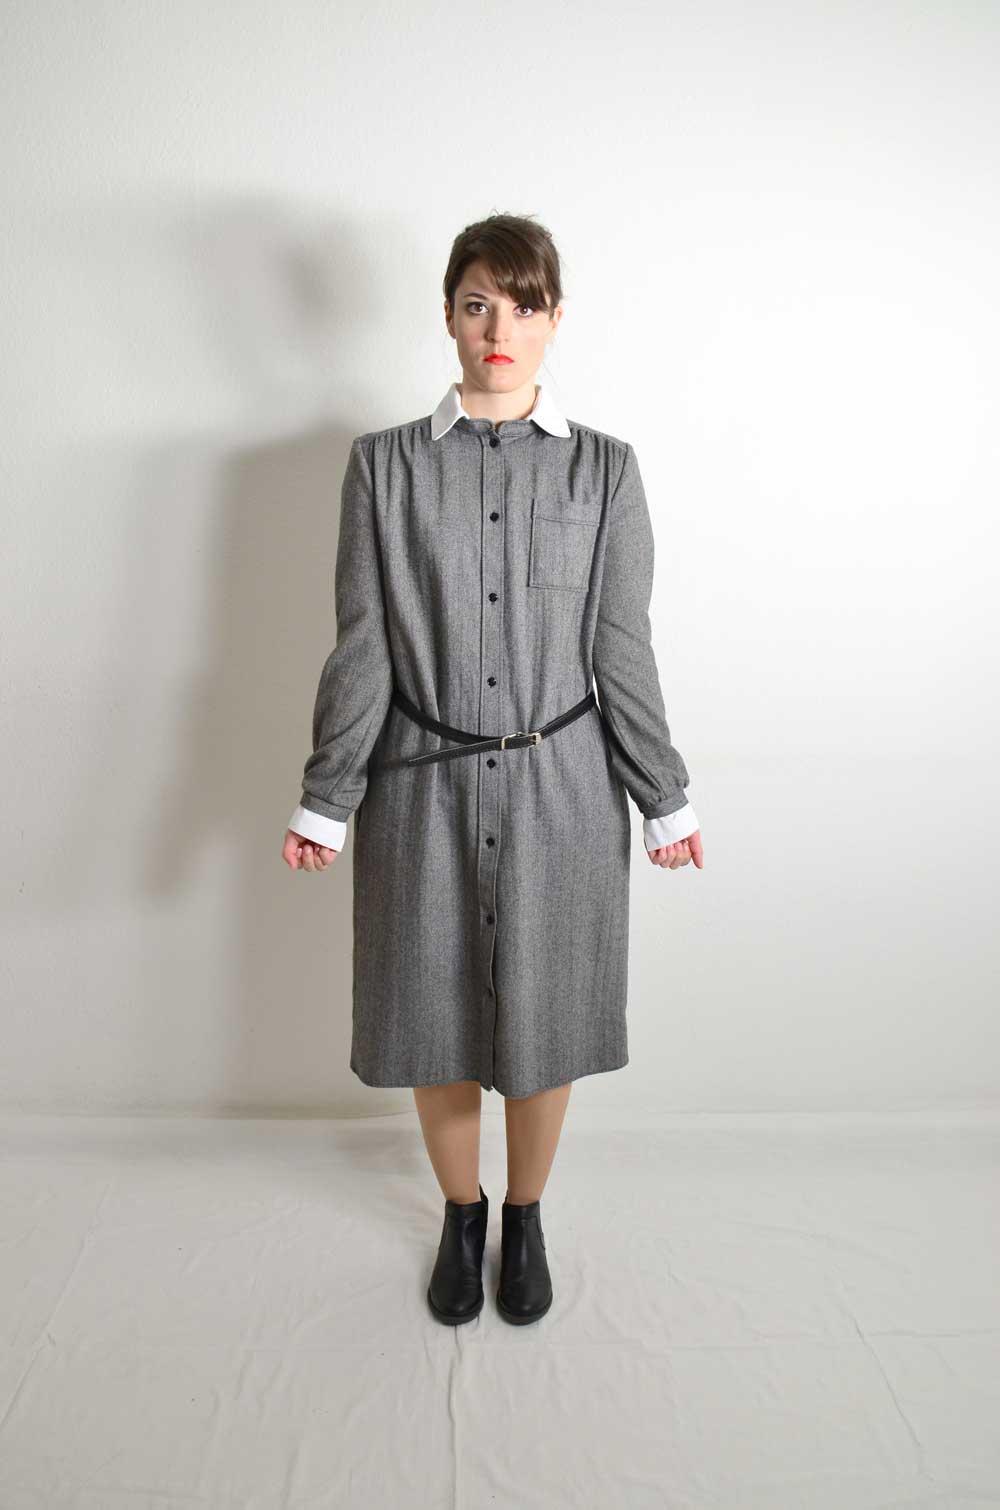 vintage kleid grau johanna mabel oma klara. Black Bedroom Furniture Sets. Home Design Ideas